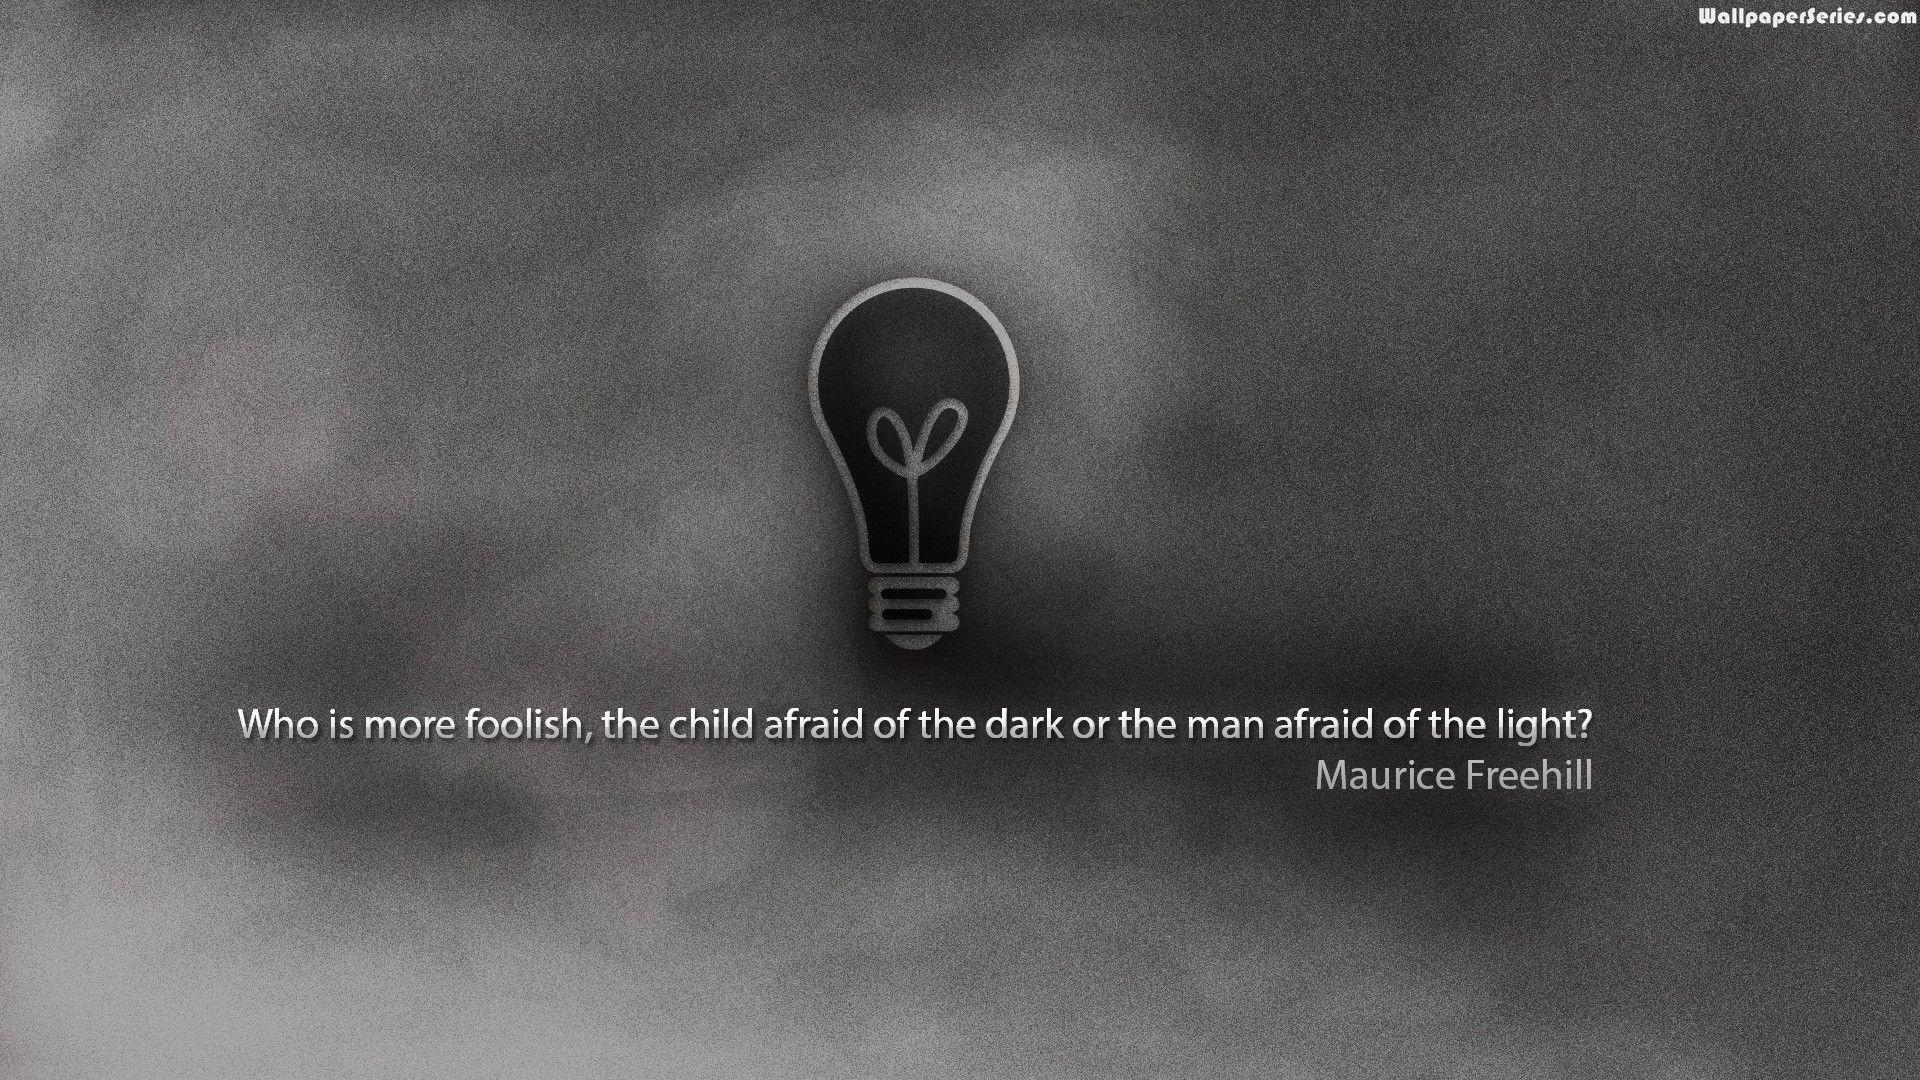 Dark Quotes Wallpapers - Wallpaper Cave